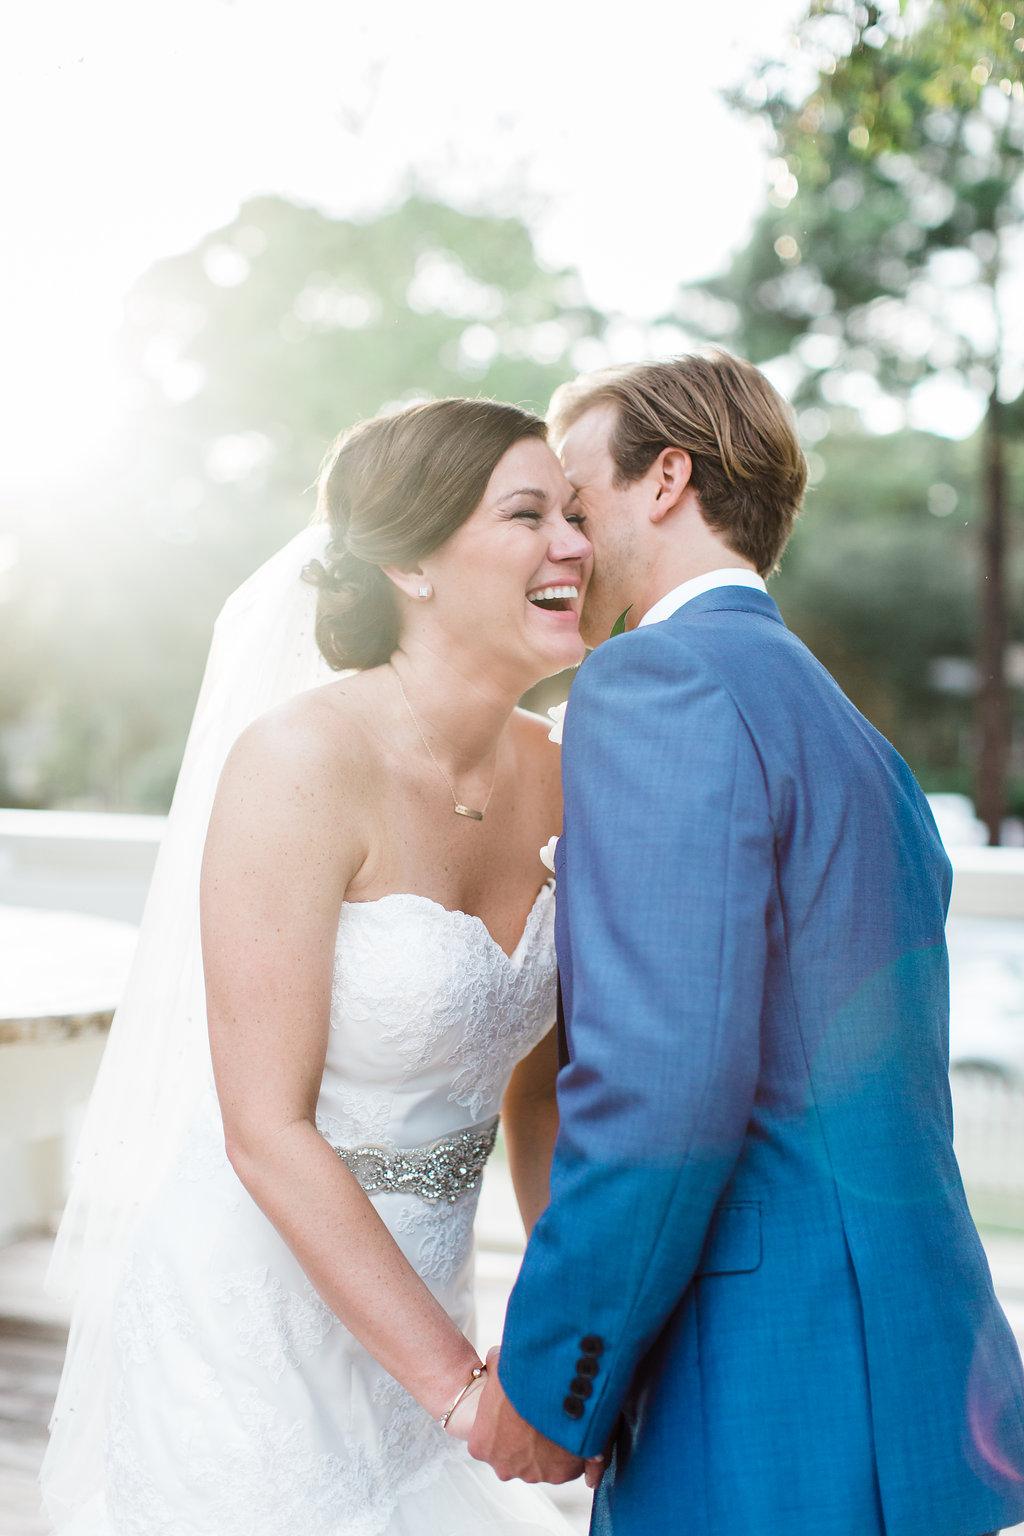 apt-b-photography-ivory-and-beau-bridal-boutique-savannah-florist-savannah-wedding-flowers-savannah-wedding-planner-tybee-island-wedding-chapel-wedding-rose-bouquet-blush-wedding-tybee-wedding-savannah-weddings-savannah-flowers-22.jpg